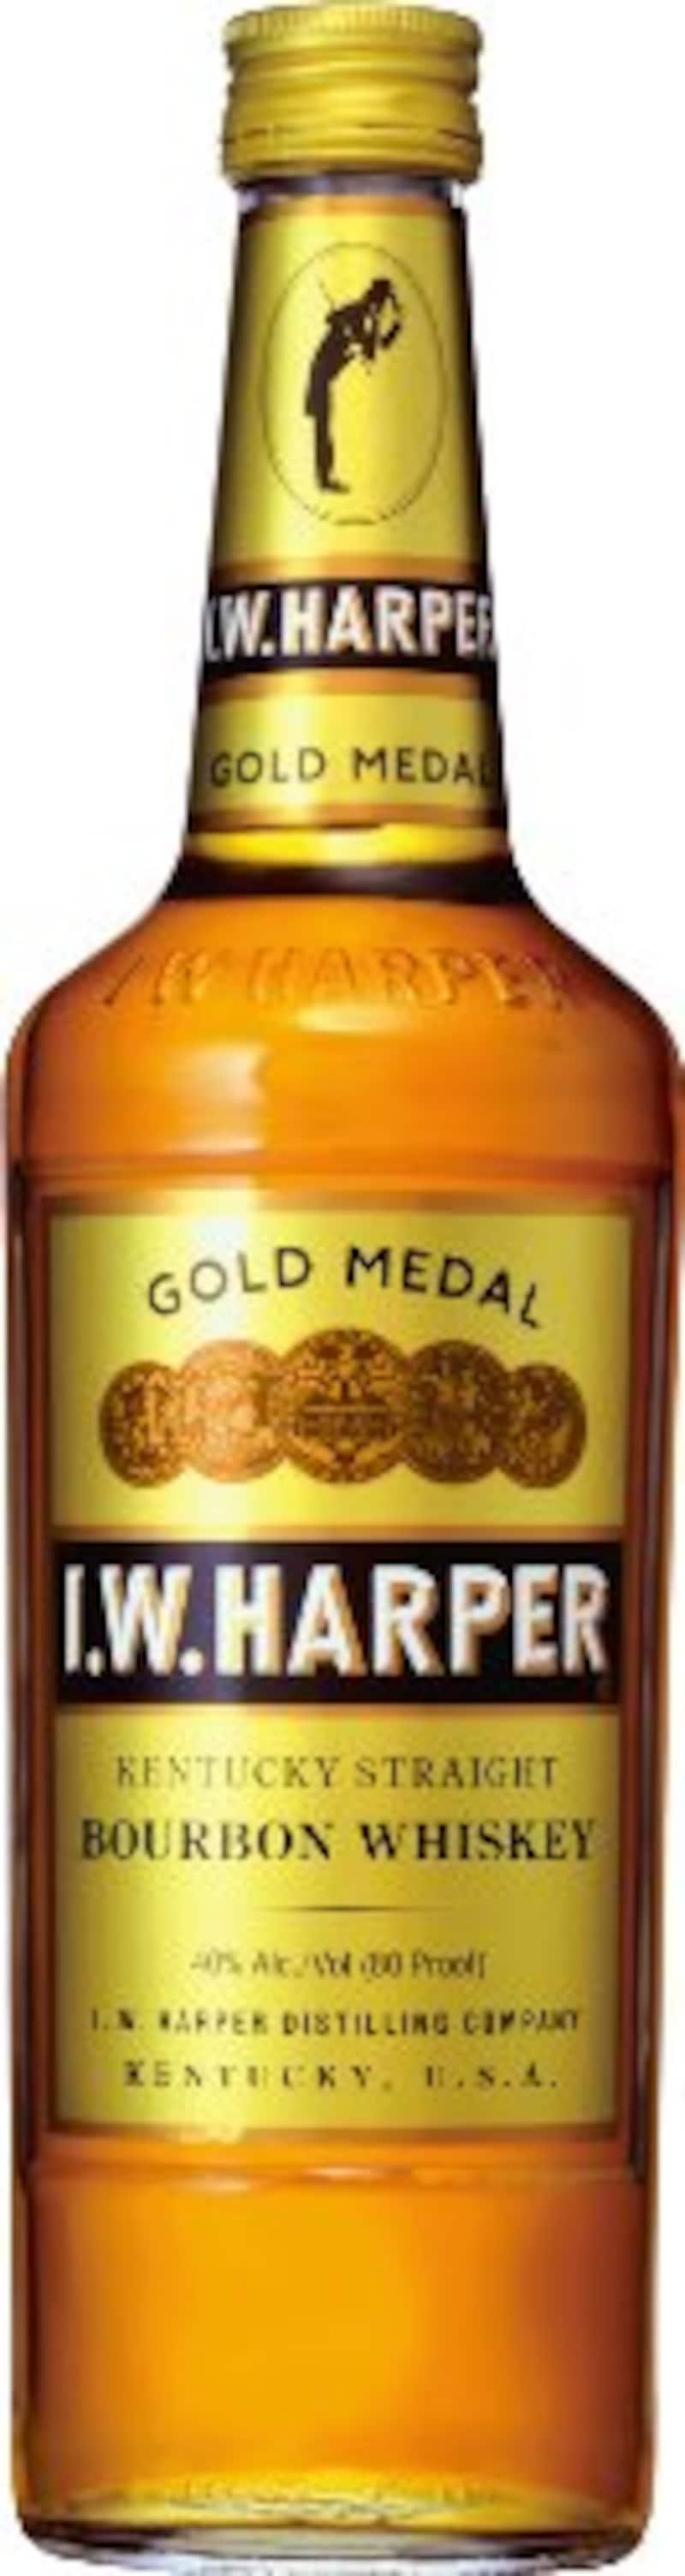 I.W.HARPER(I.W.ハーパー),I.W.ハーパー ゴールドメダル